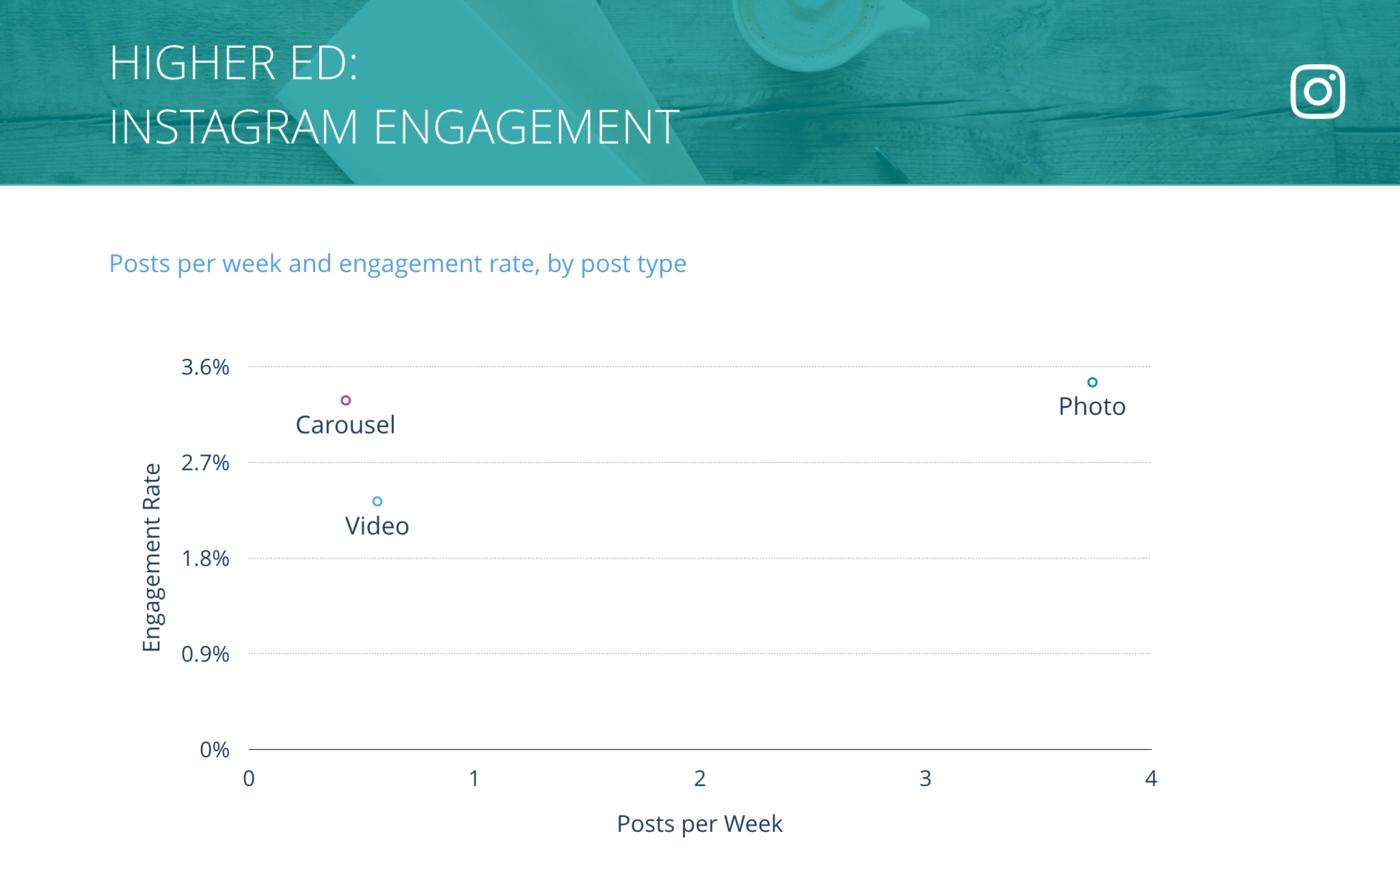 slide for Instagram Posts per Week vs. Engagement Rate per Post, Higher Ed